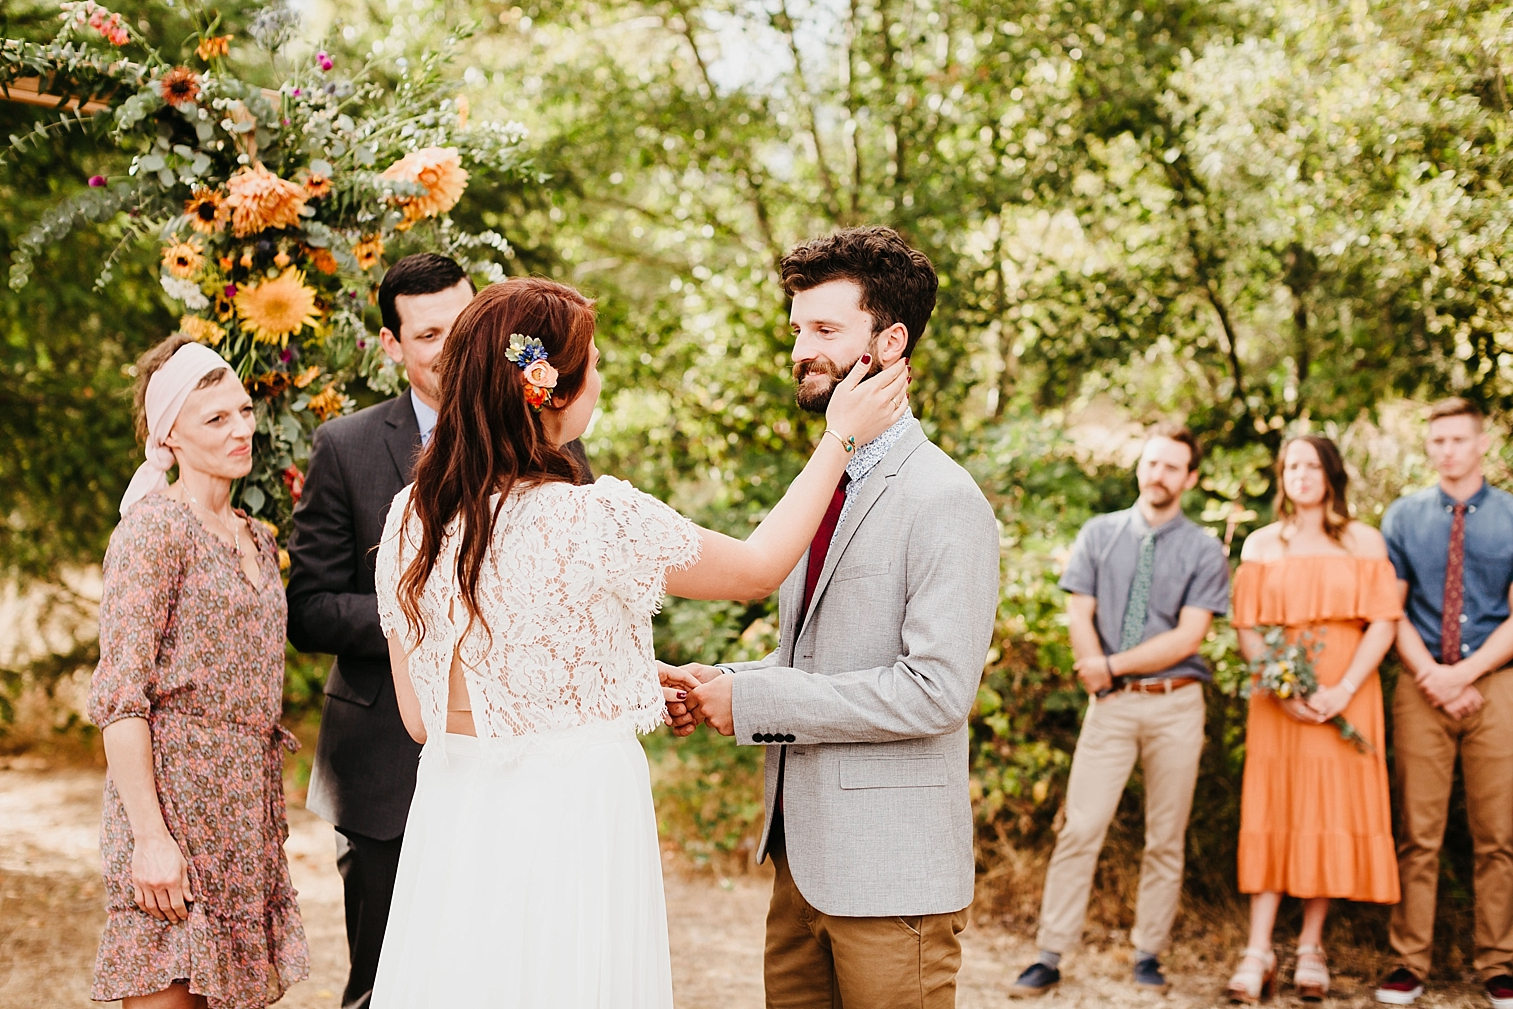 Summer-Camp-Themed-Wedding-100.jpg